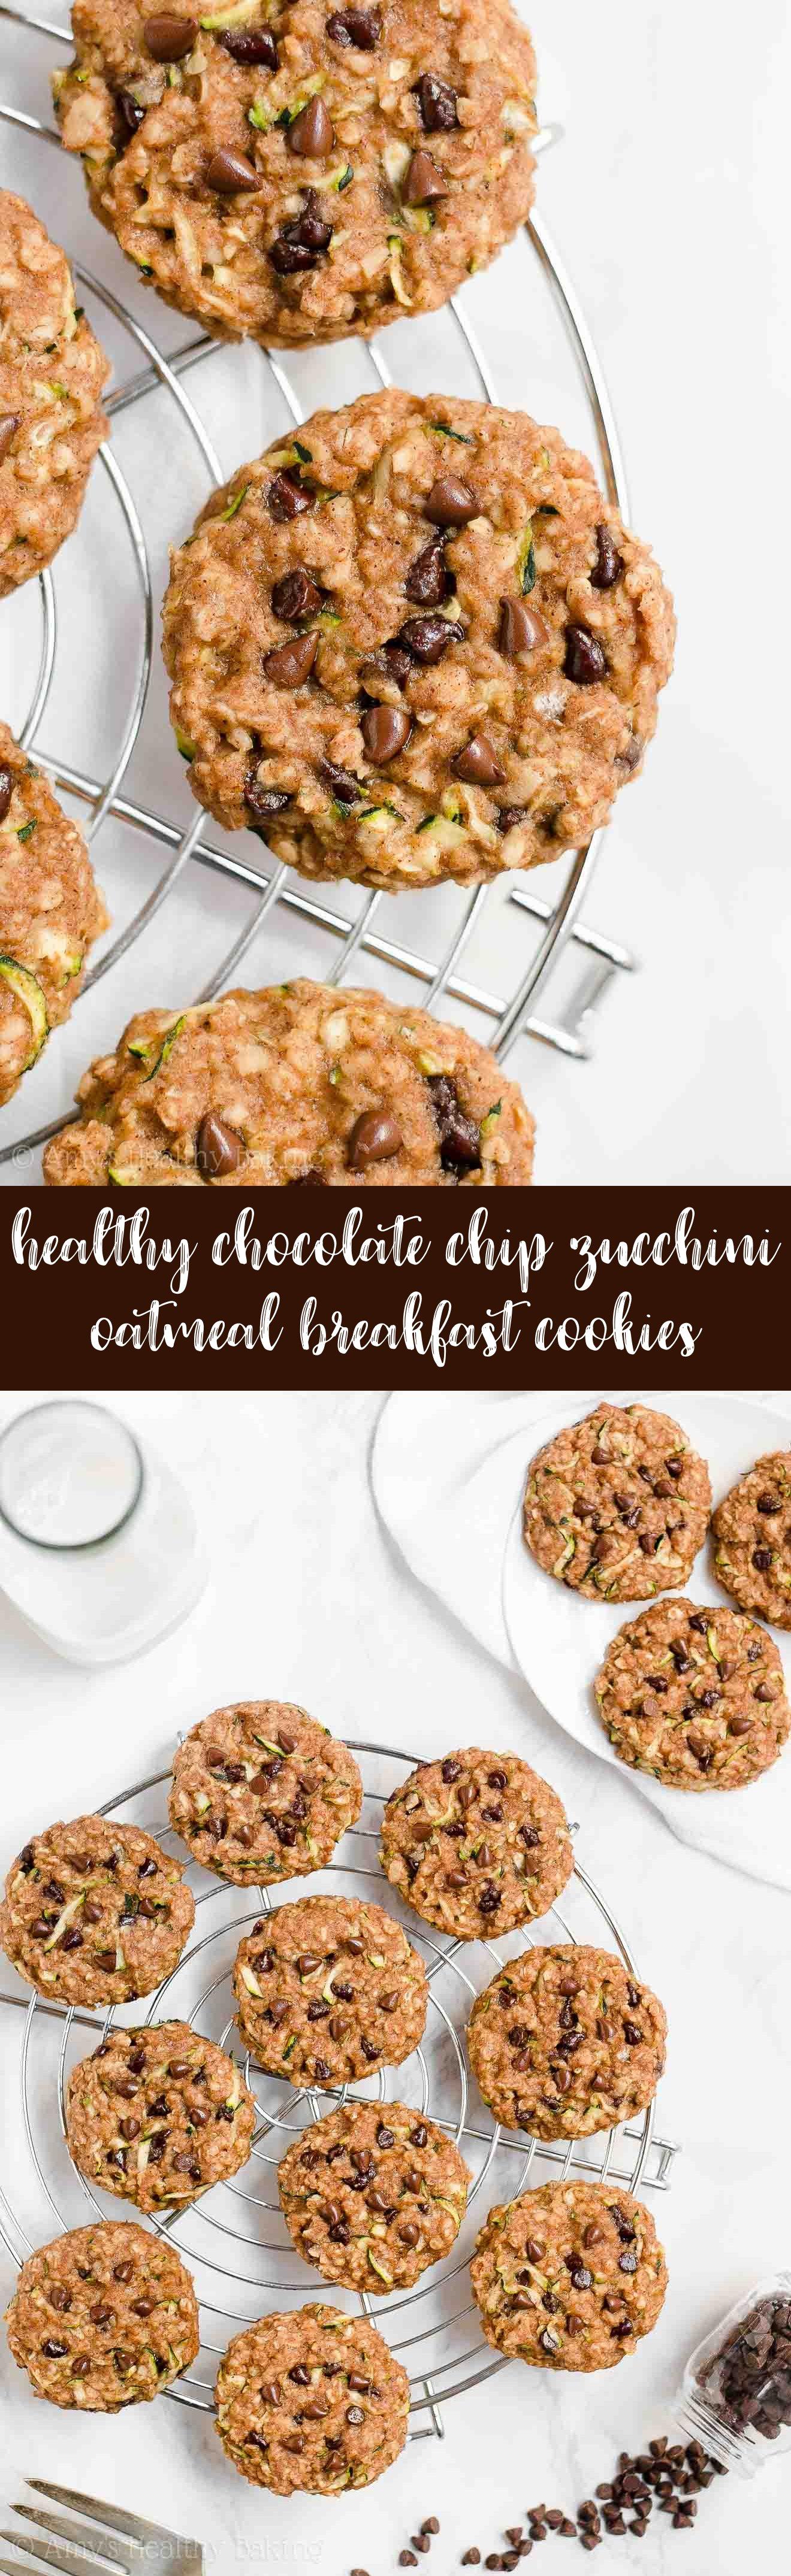 Best Healthy Chocolate Chip Zucchini Oatmeal Breakfast Cookies